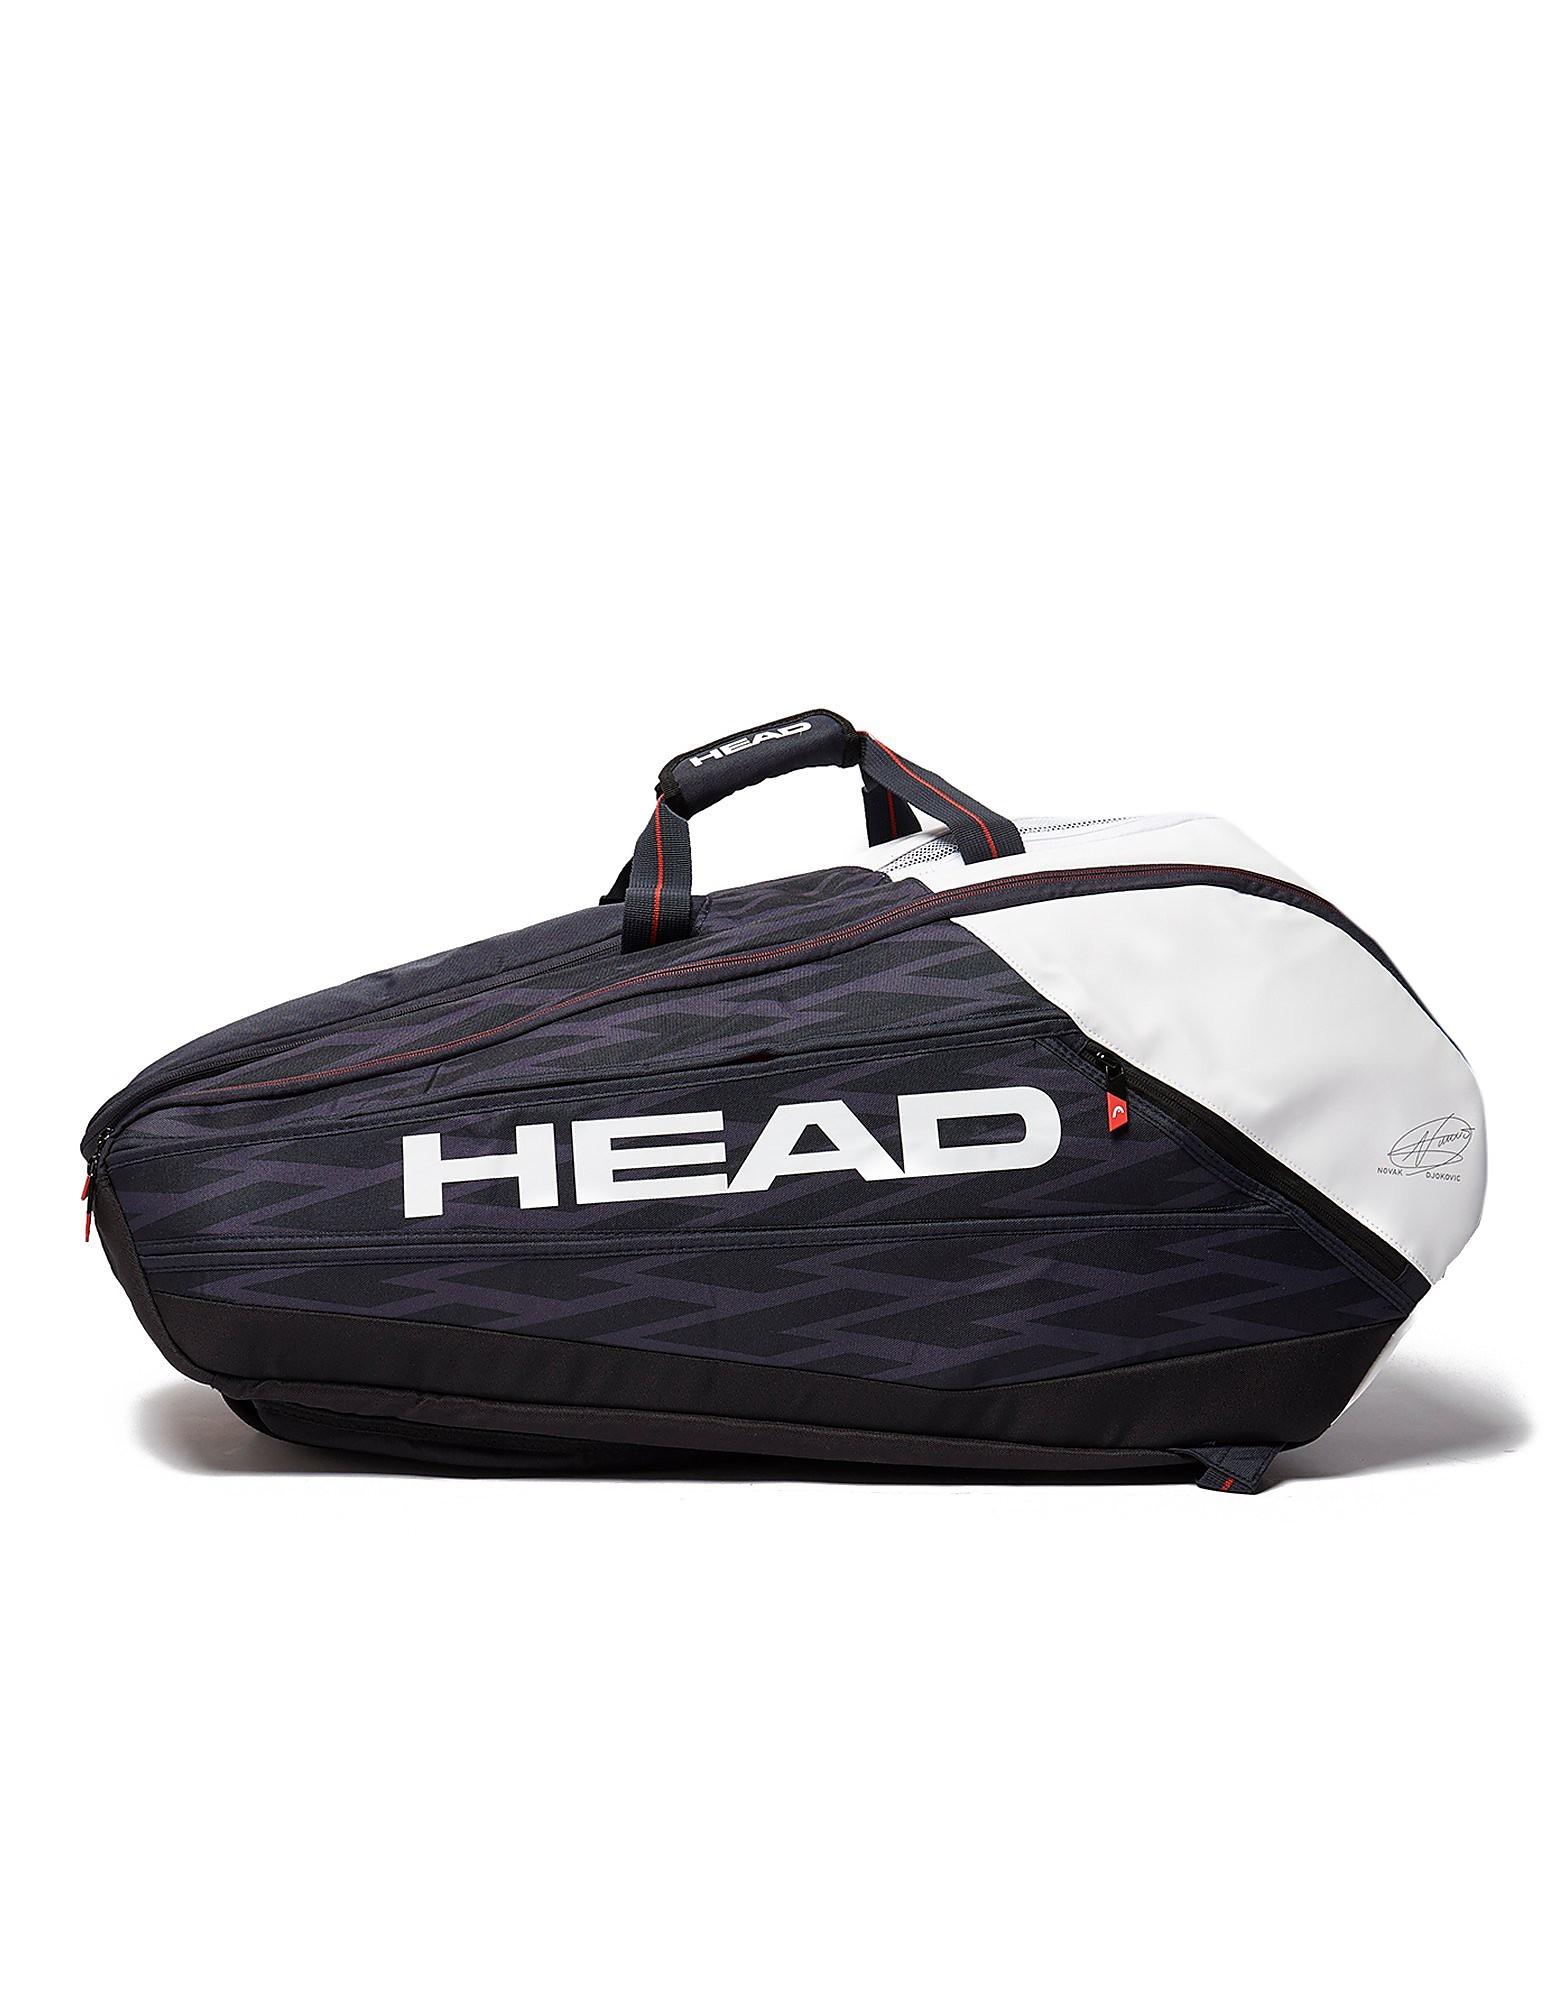 Head Djokovic 12R Monstercombi Tennis Holdall